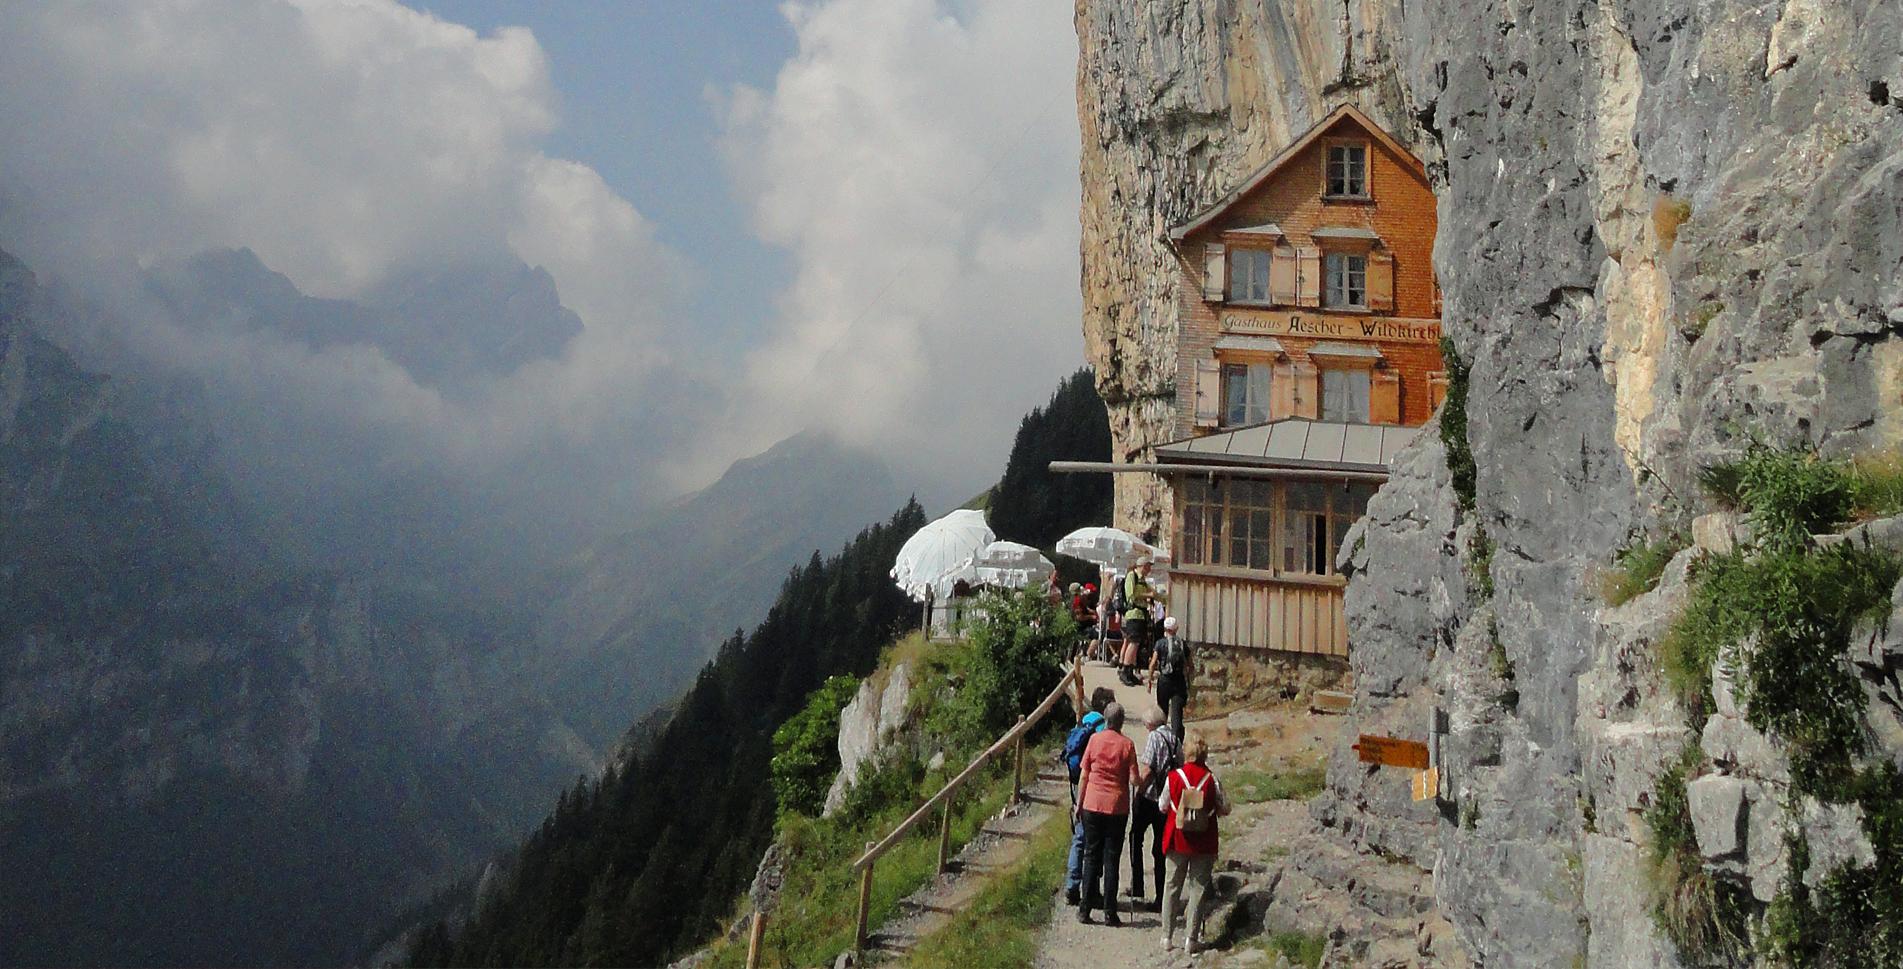 Wanderung im Appenzell: Äscher-Wildkirchli – Seealpsee